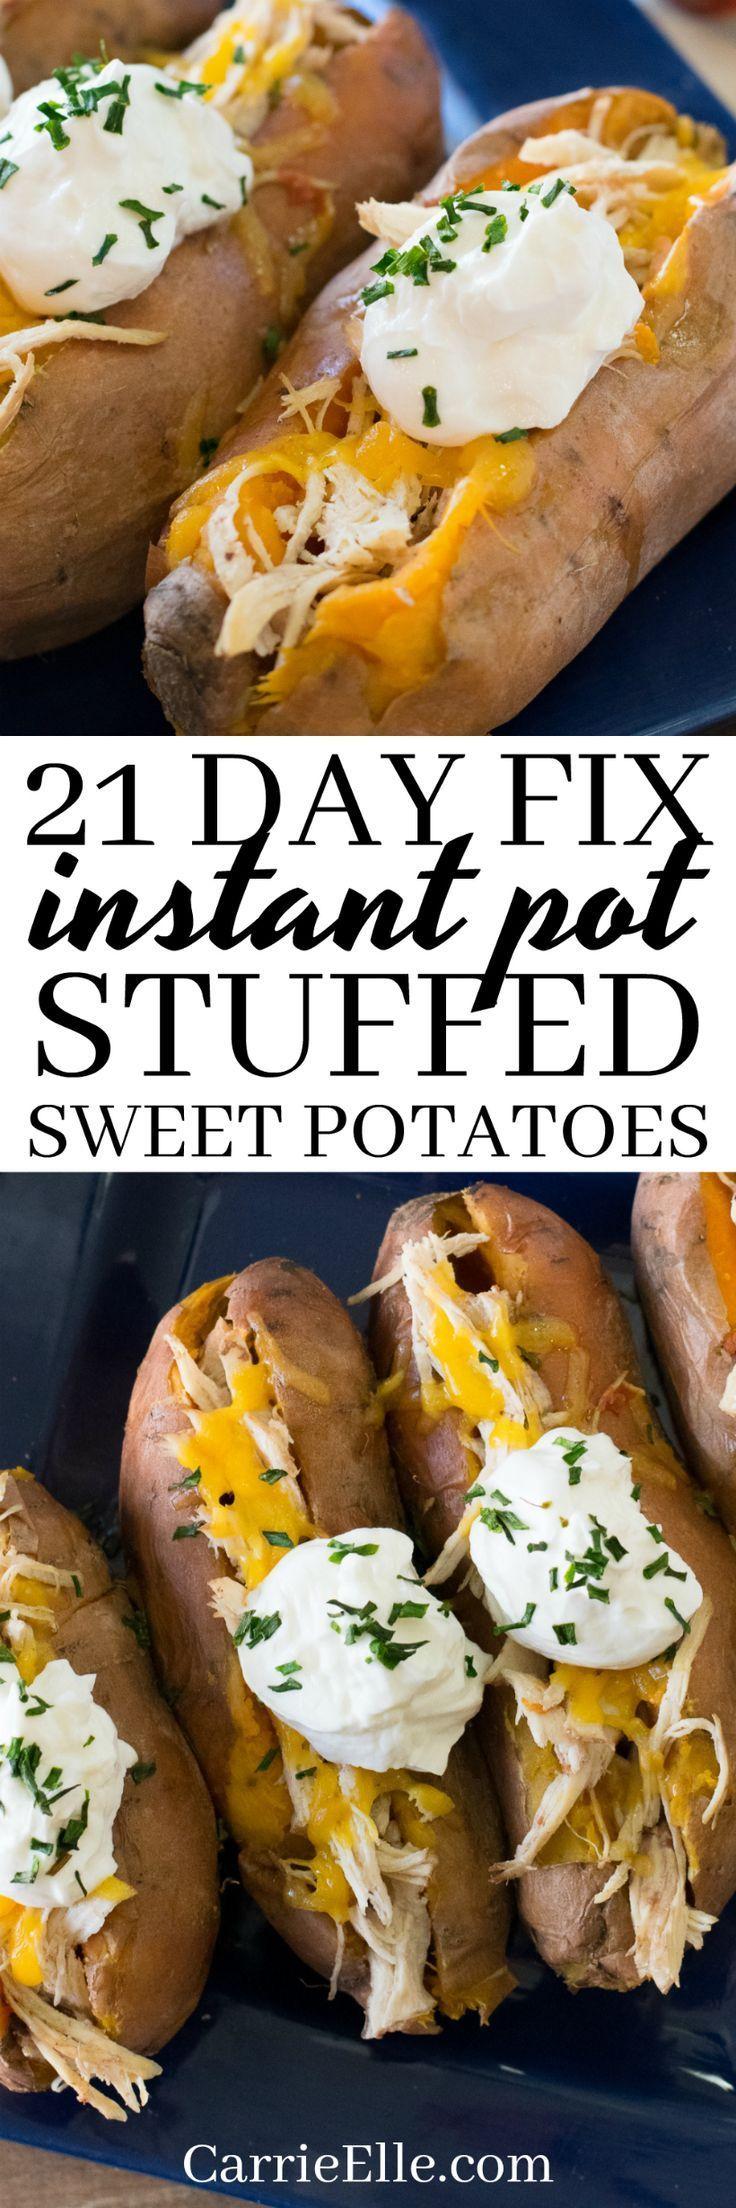 21 Day Fix Instant Pot Sweet Potatoes